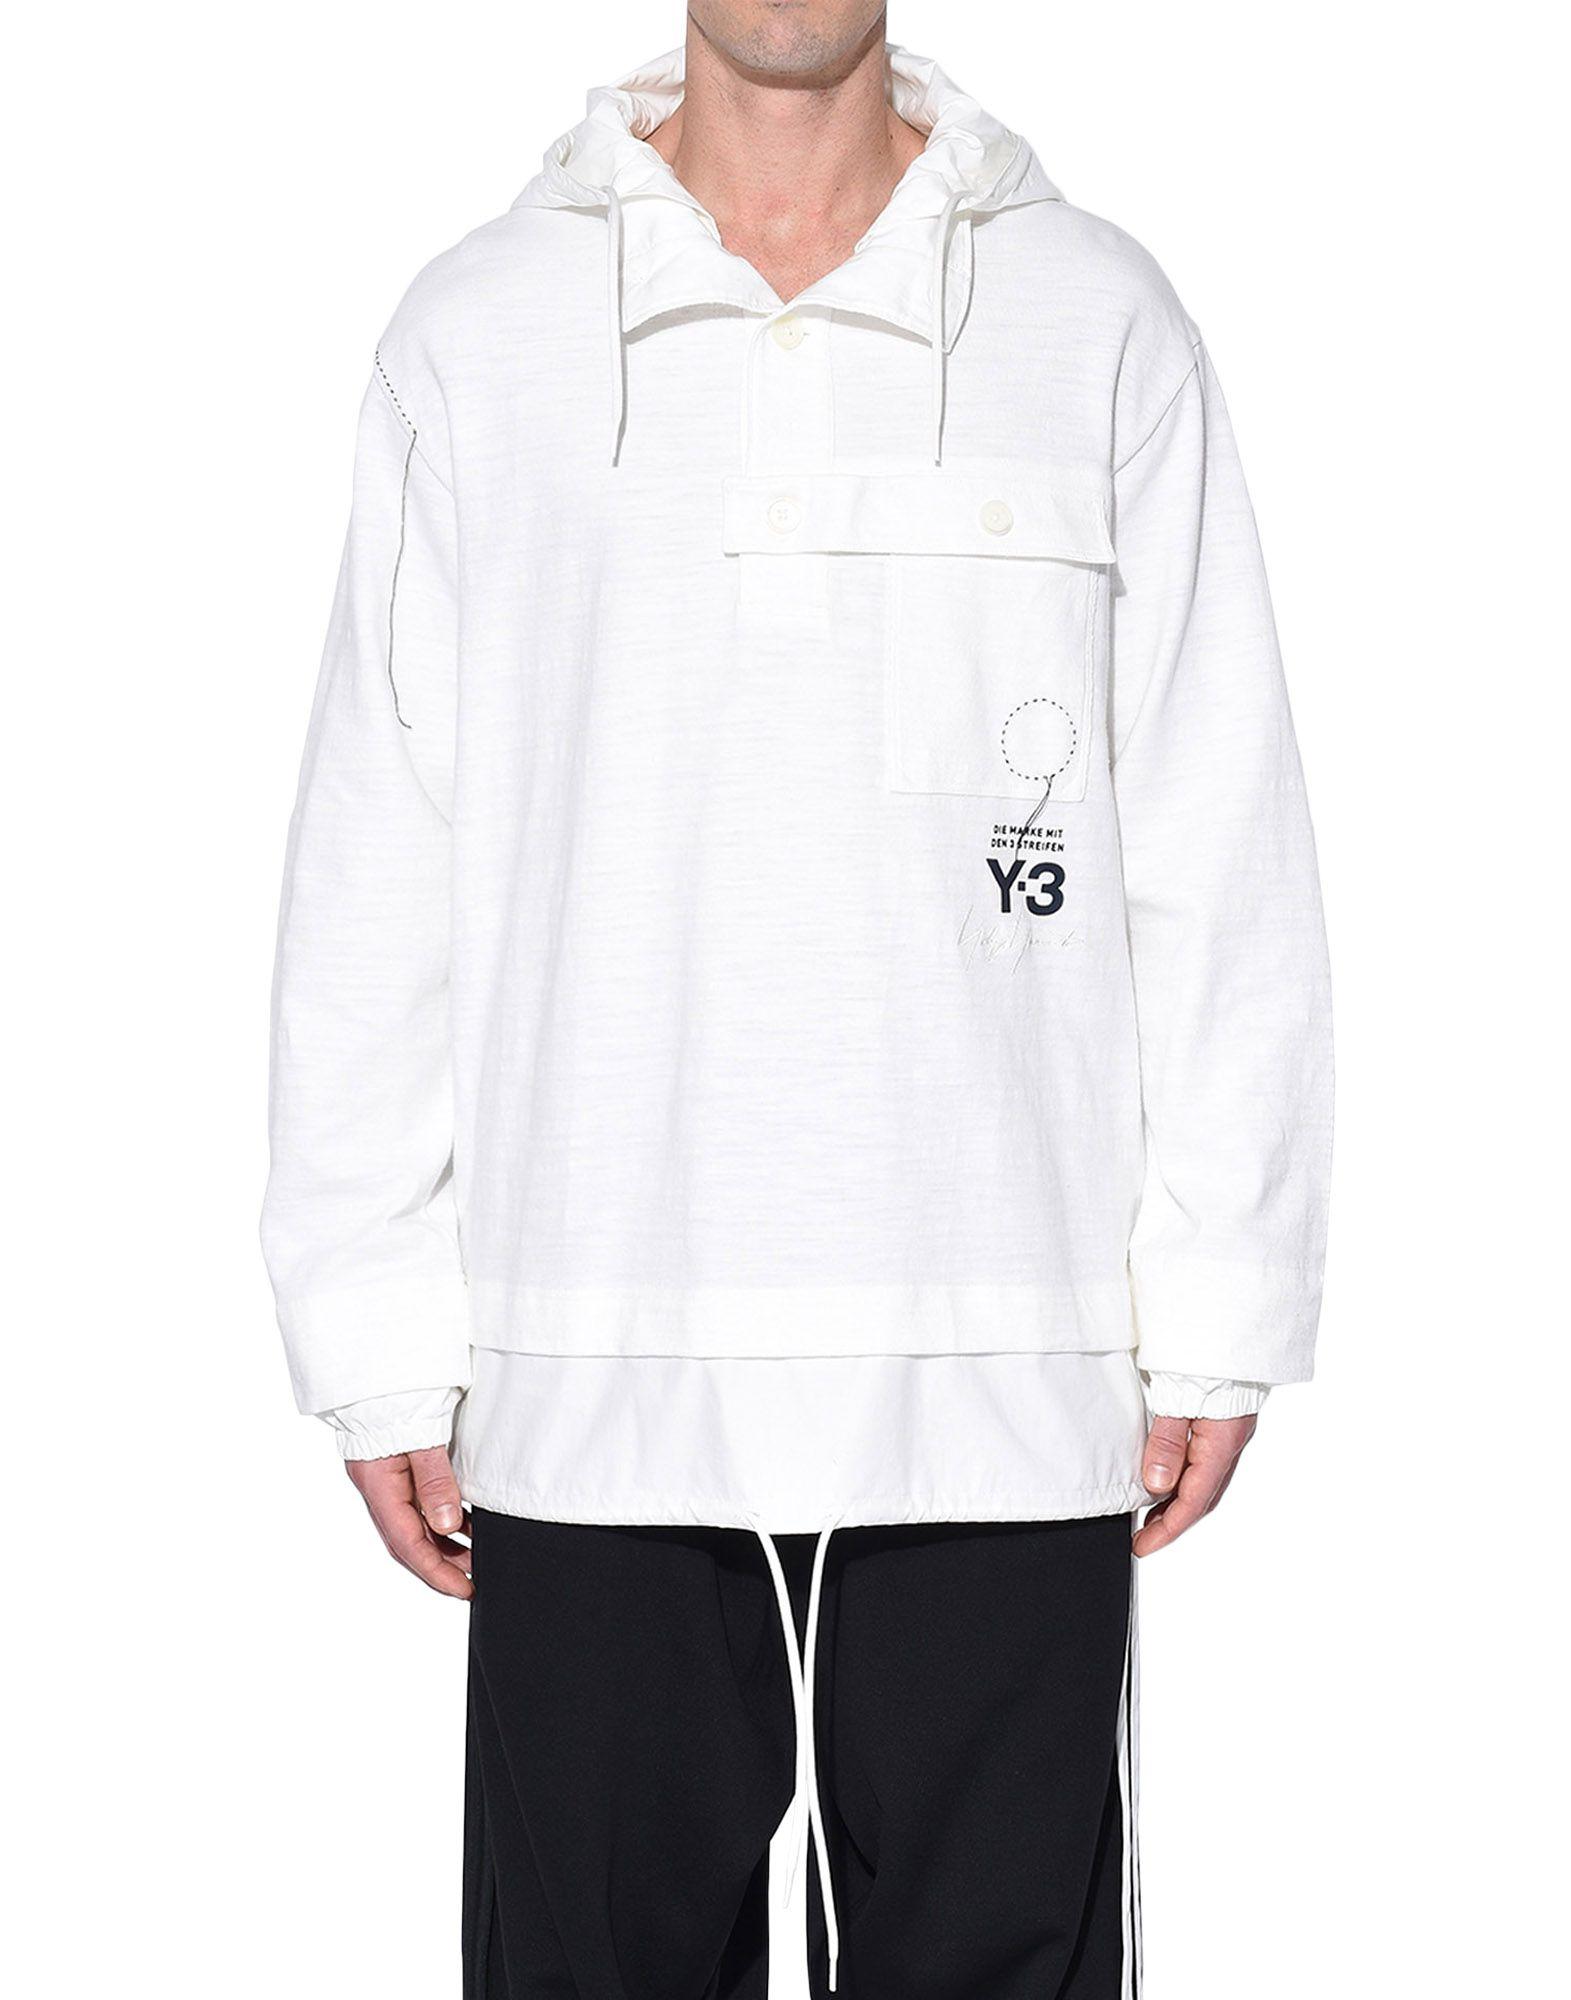 Y-3 Y-3 Sashiko Layered Hoodie Hooded sweatshirt Man r